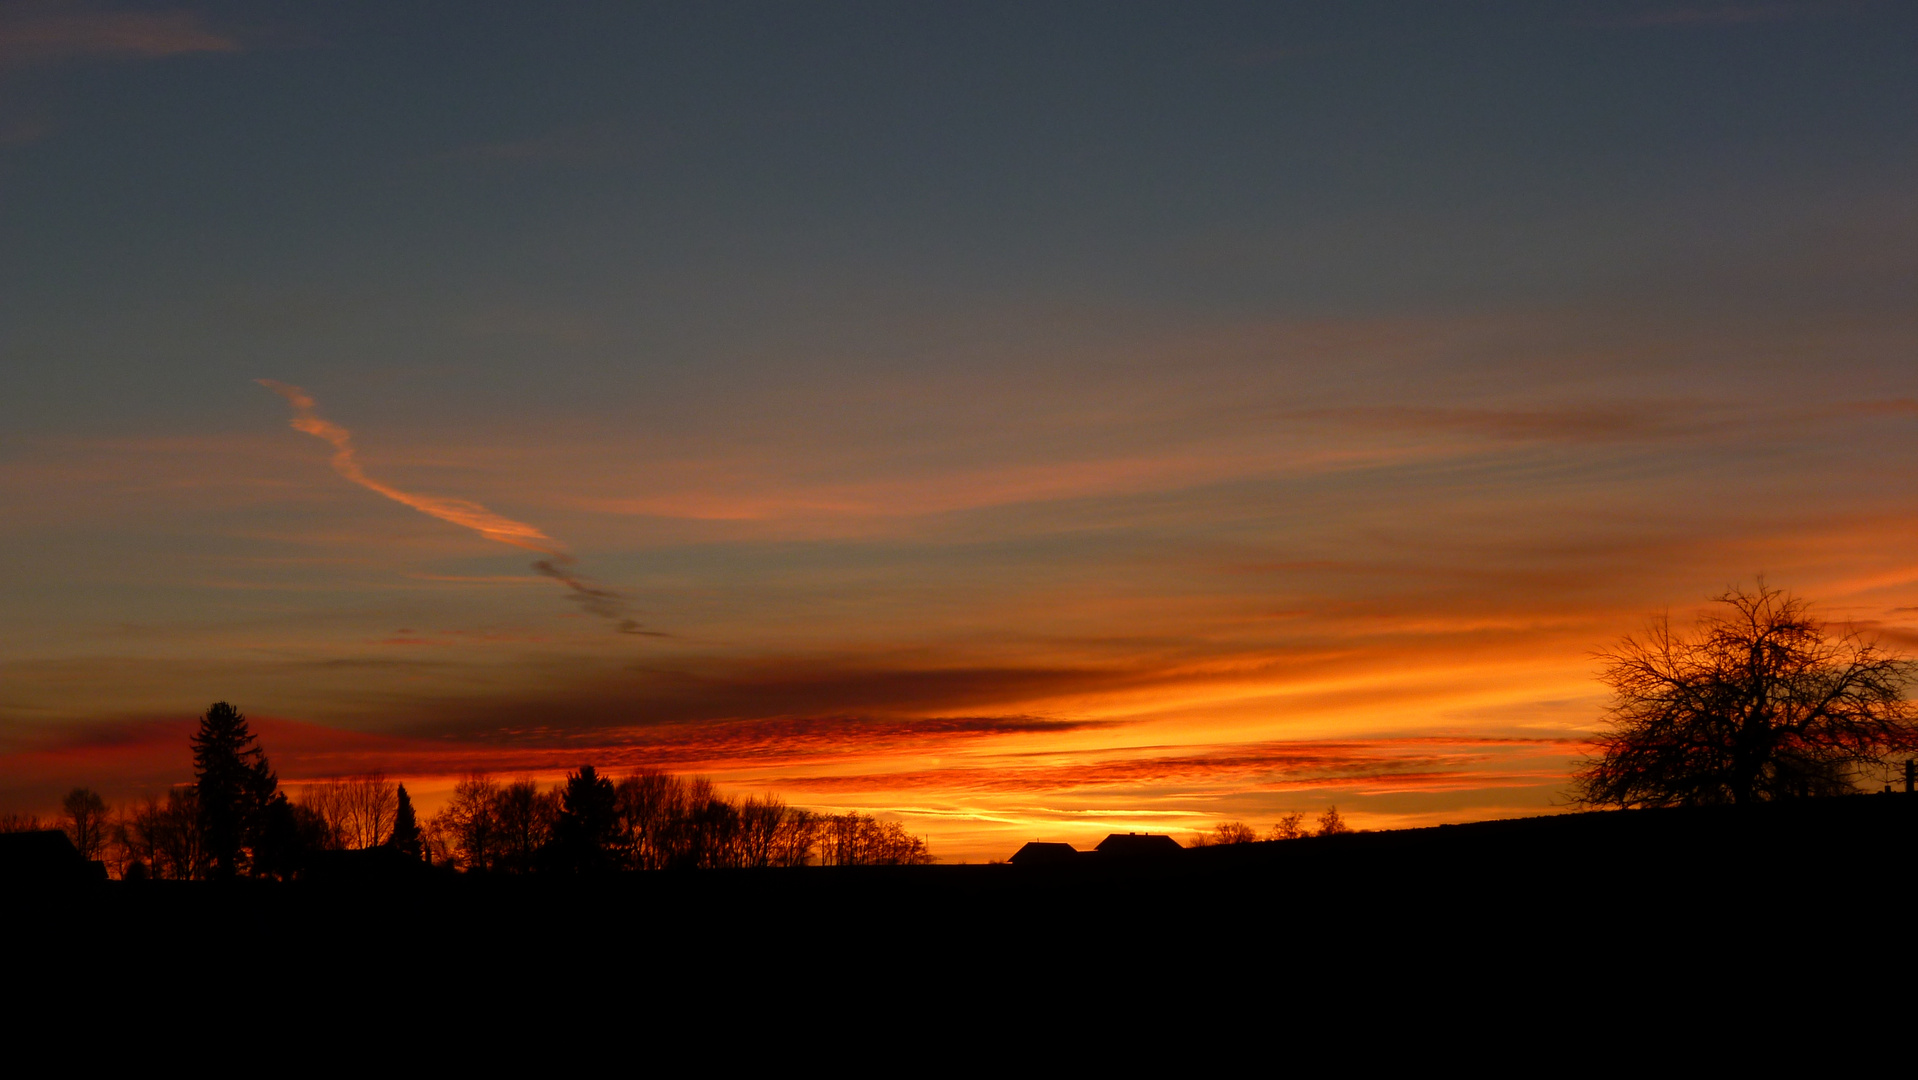 Sonnenuntergang in Niederbayern